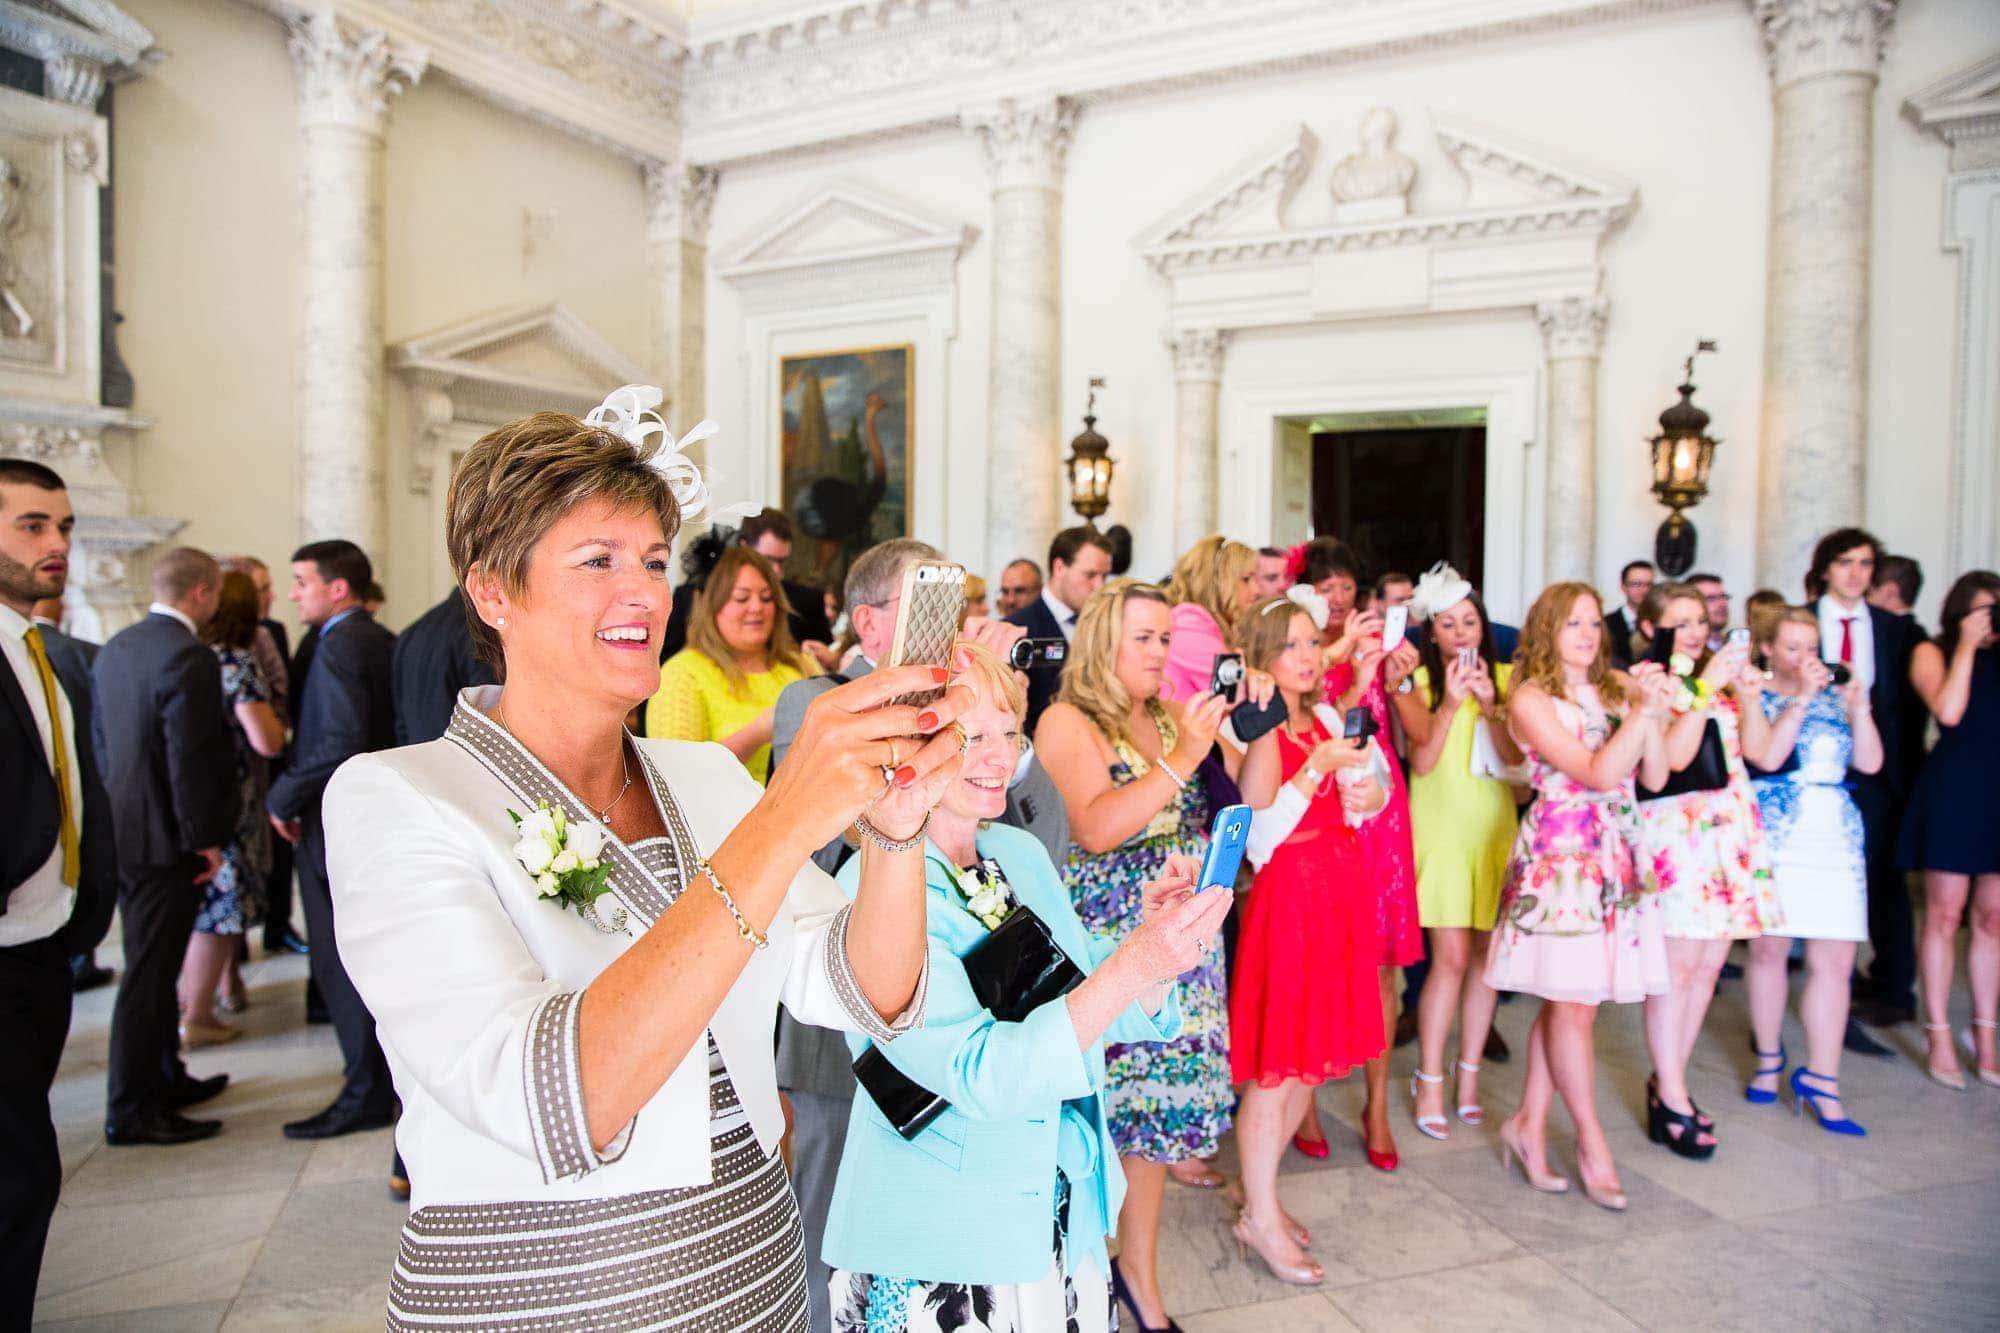 Clandon Park Wedding Photographer 56 5726